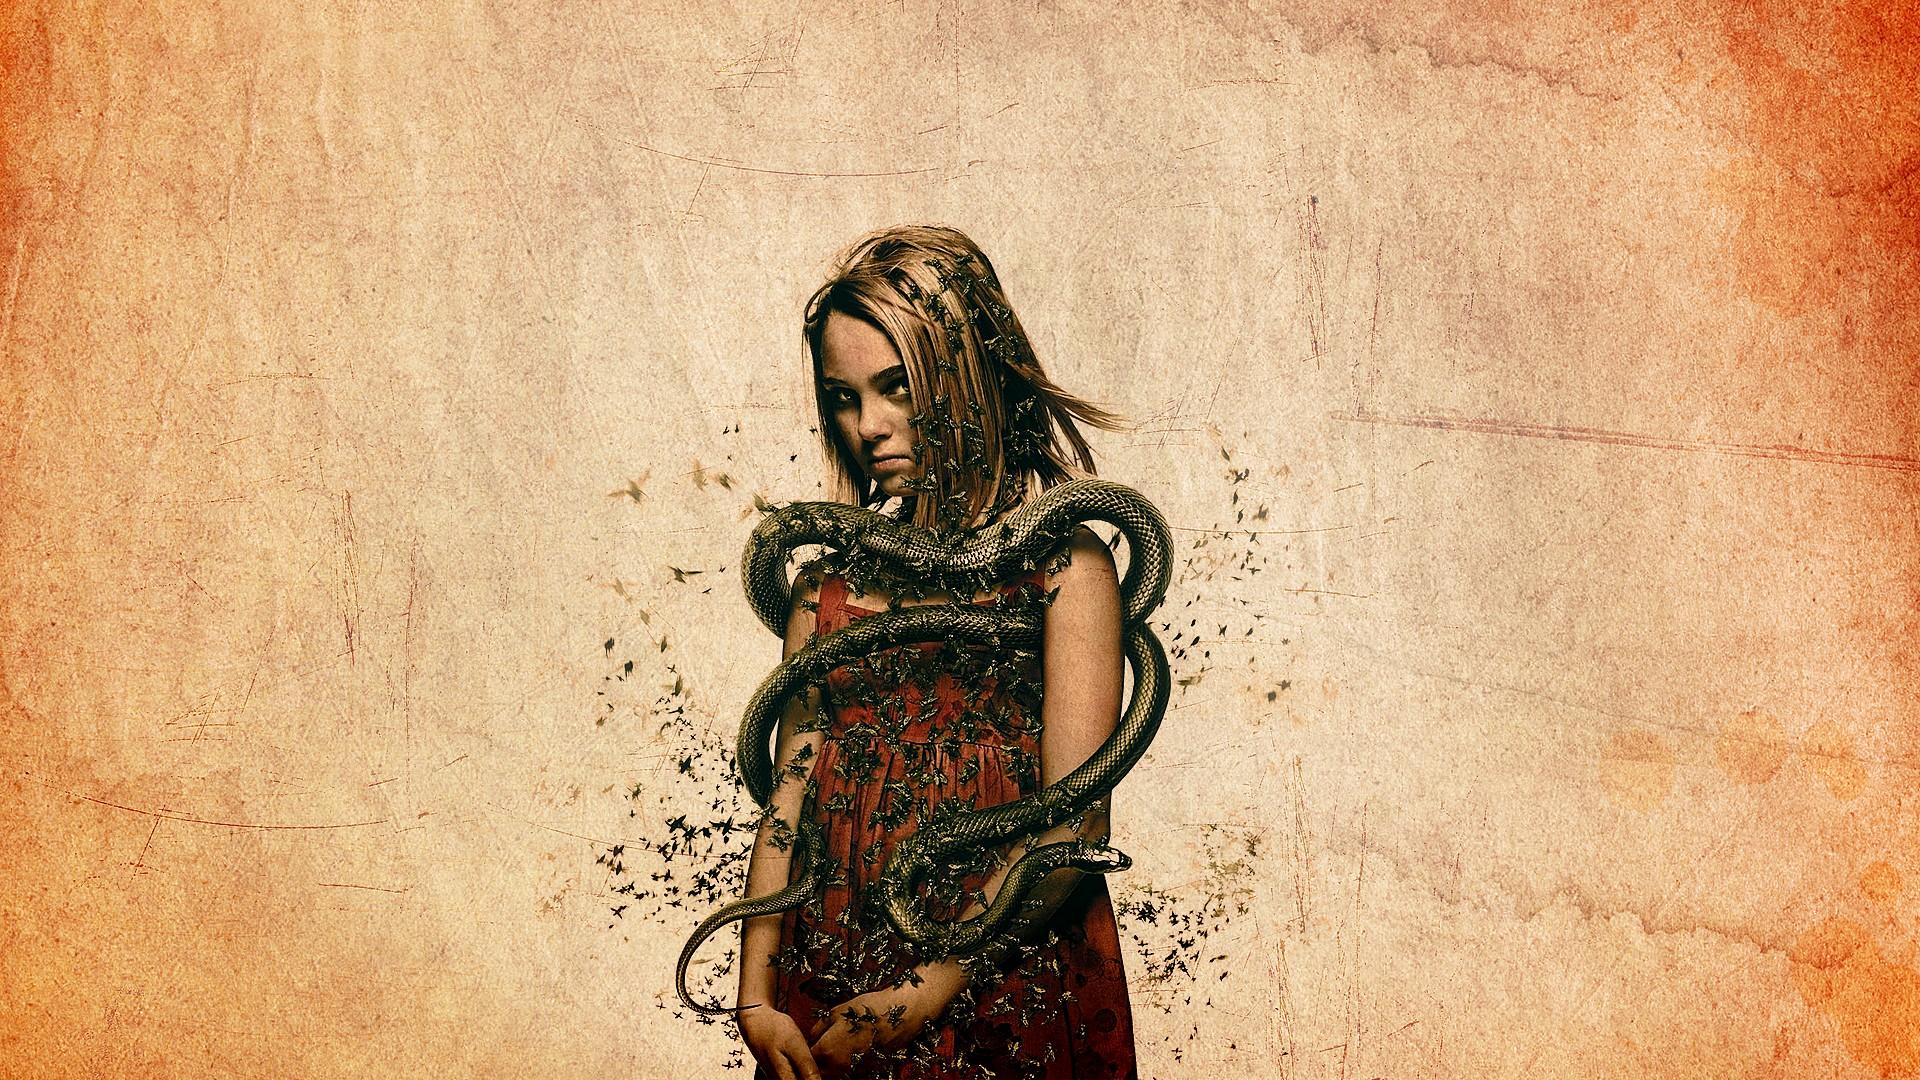 The Reaping Bugs Snake Annasophia Robb Dark Wallpaper X  Wallpaperup